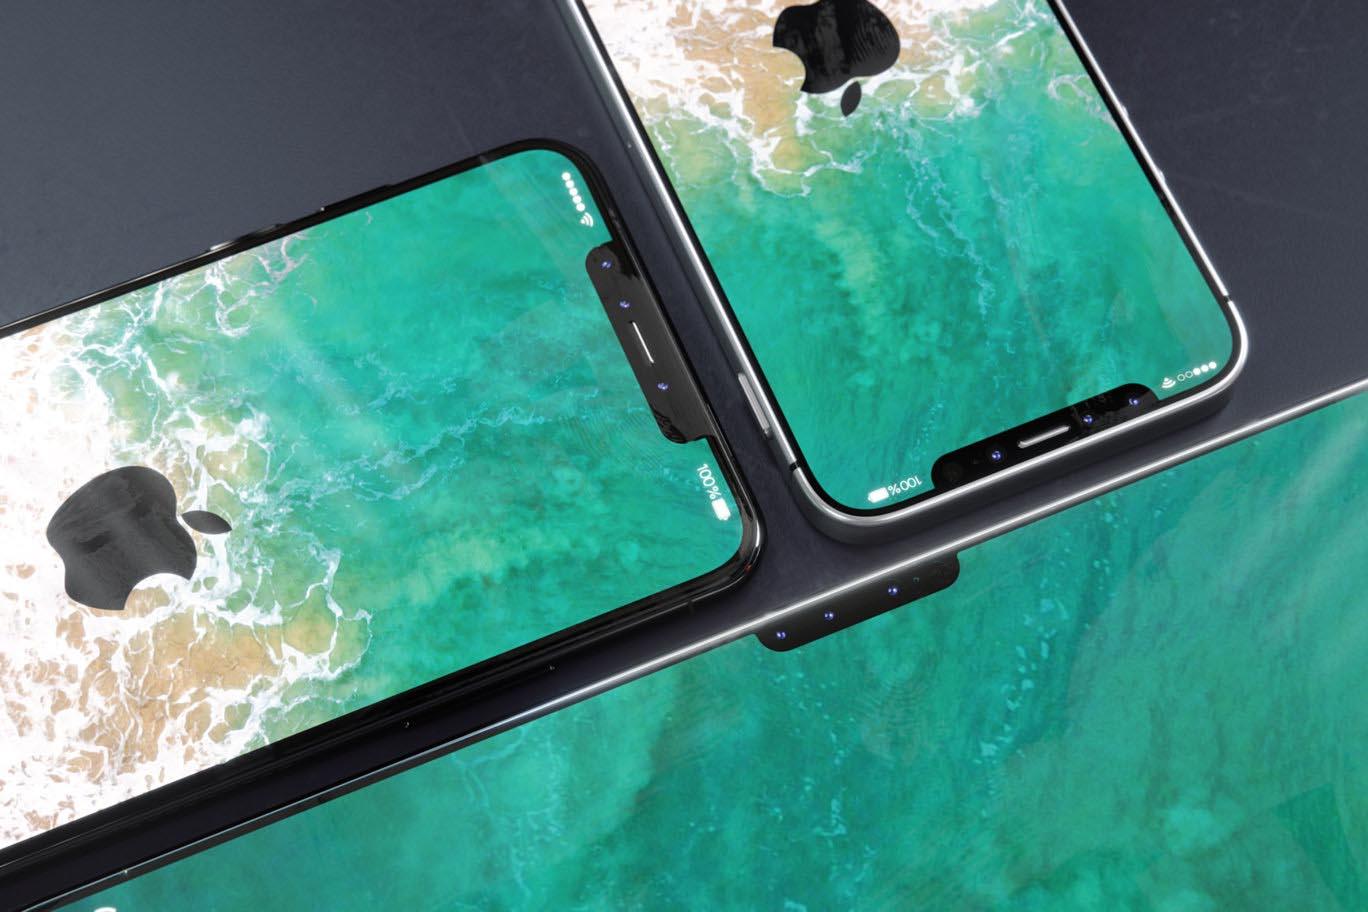 iPhone X notch concept